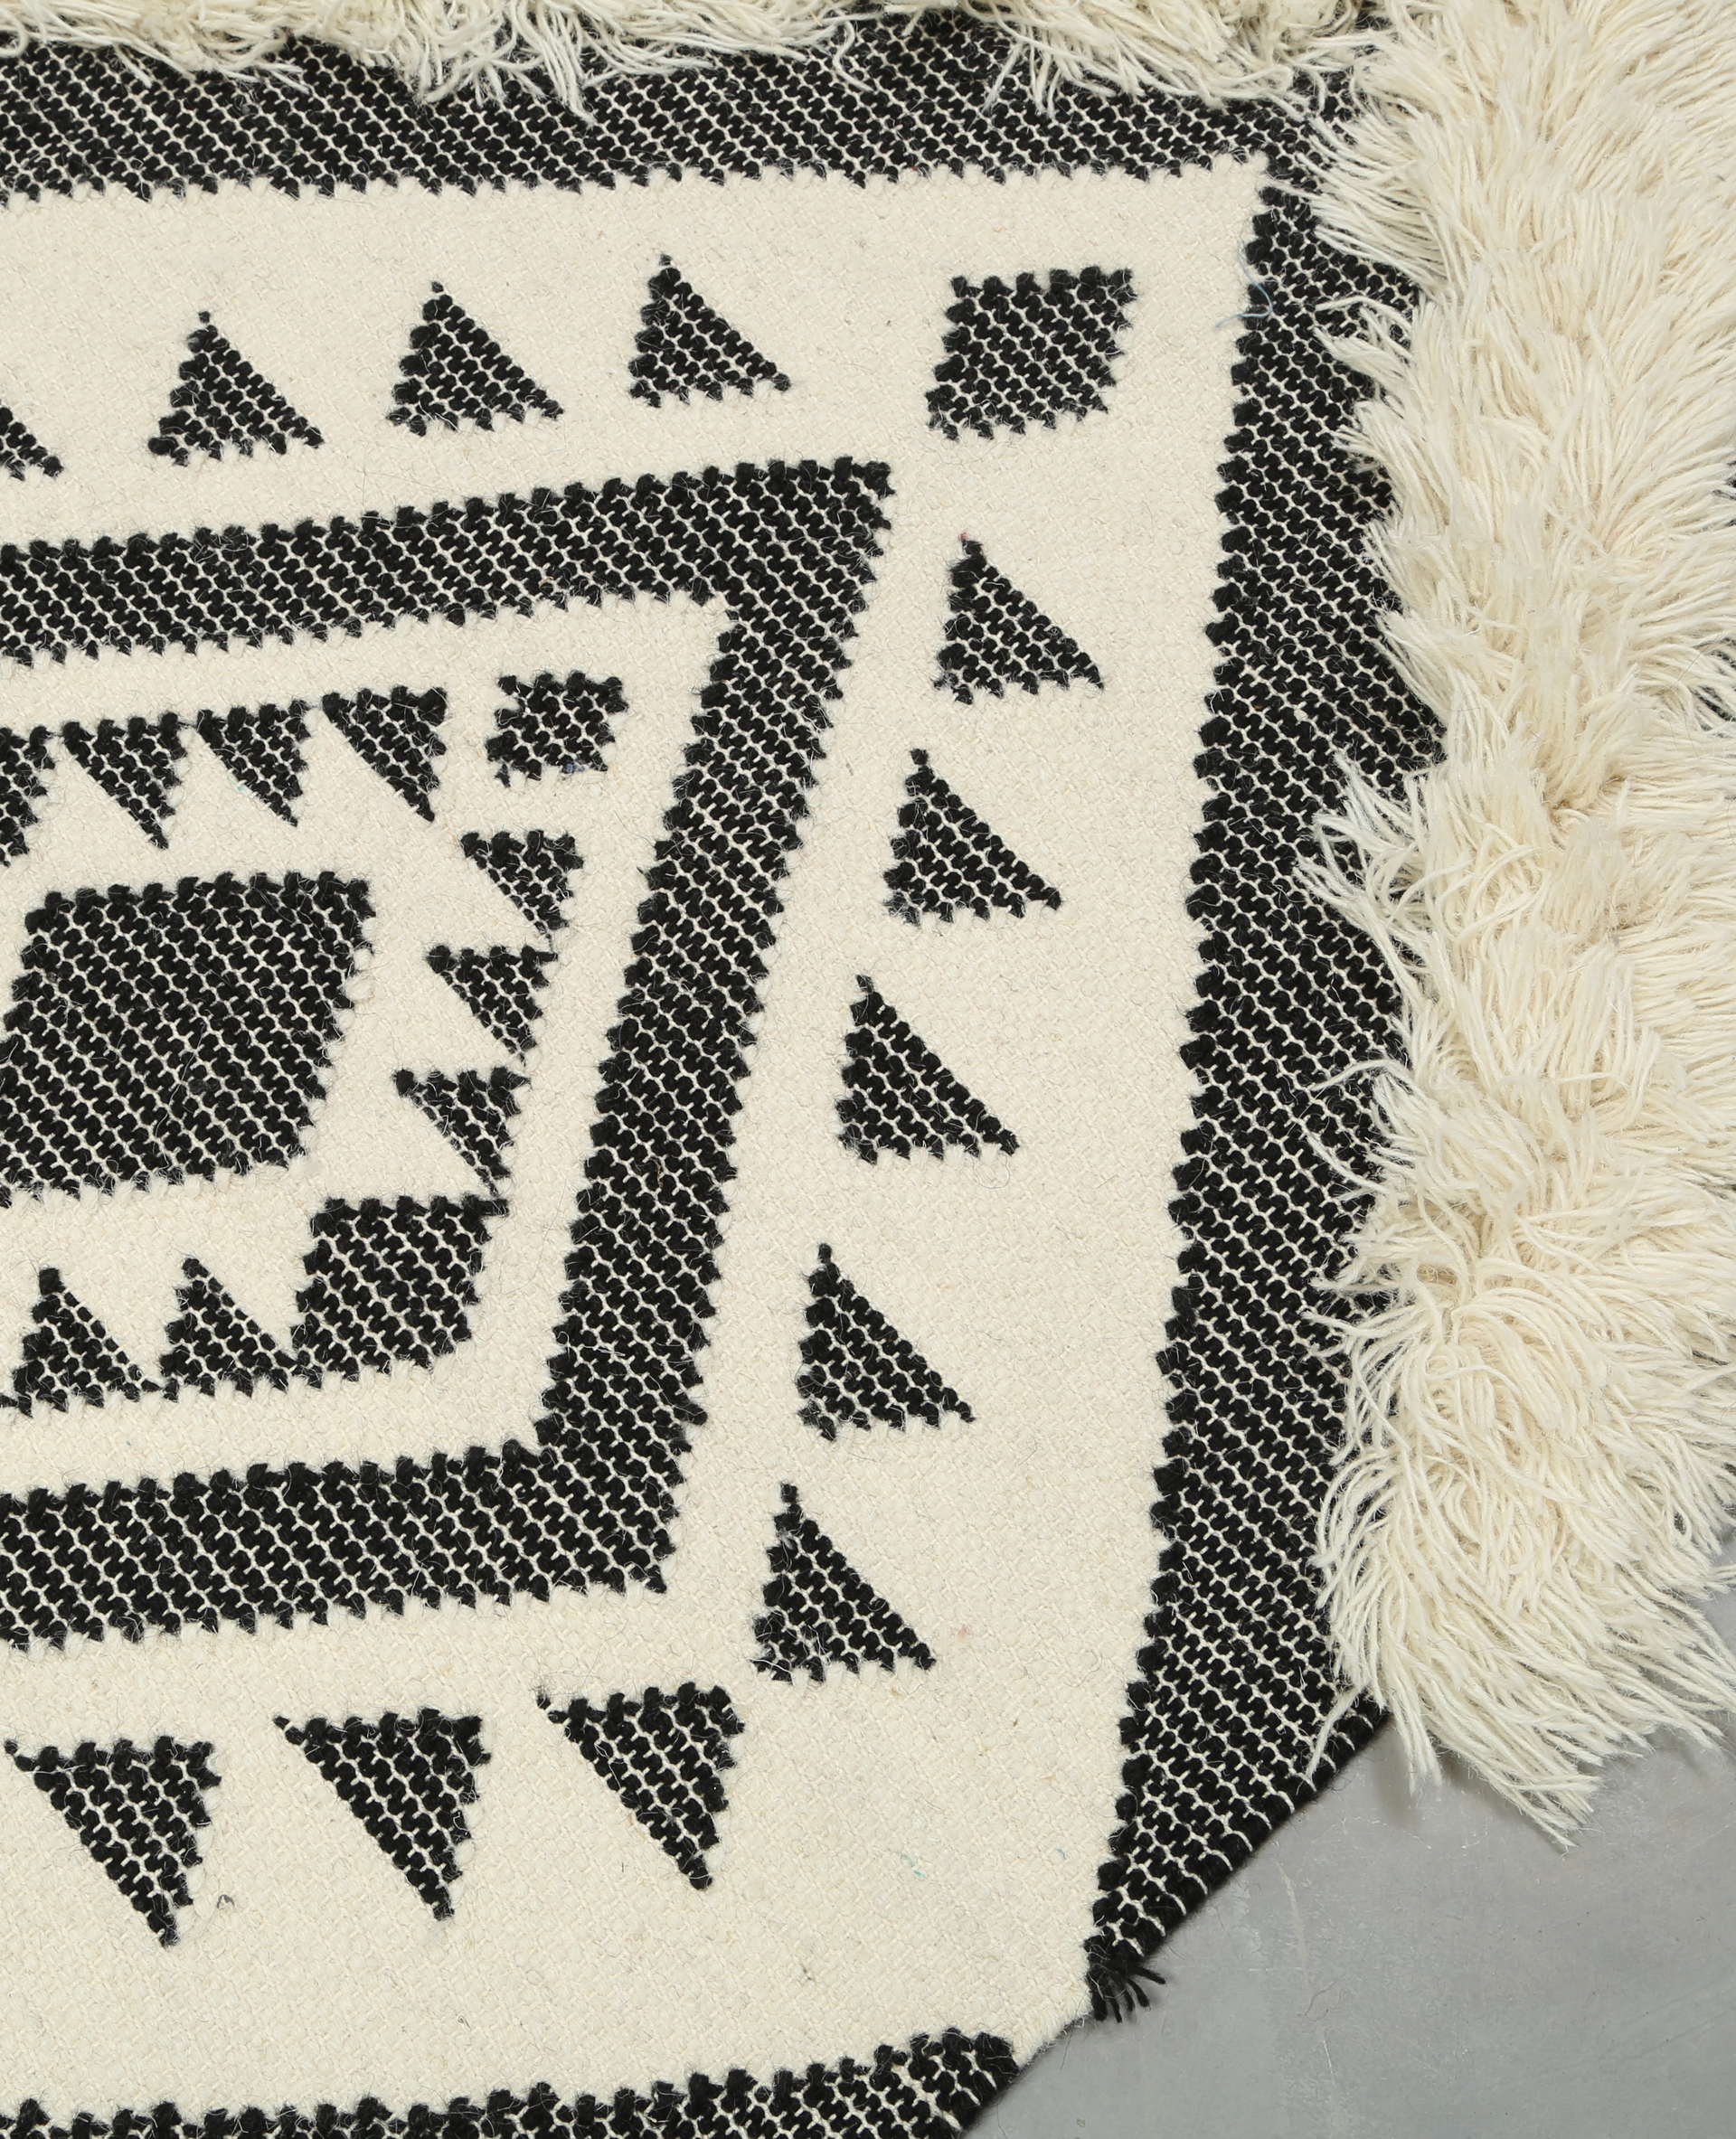 tapis style berb re gris 902233888g09 pimkie. Black Bedroom Furniture Sets. Home Design Ideas